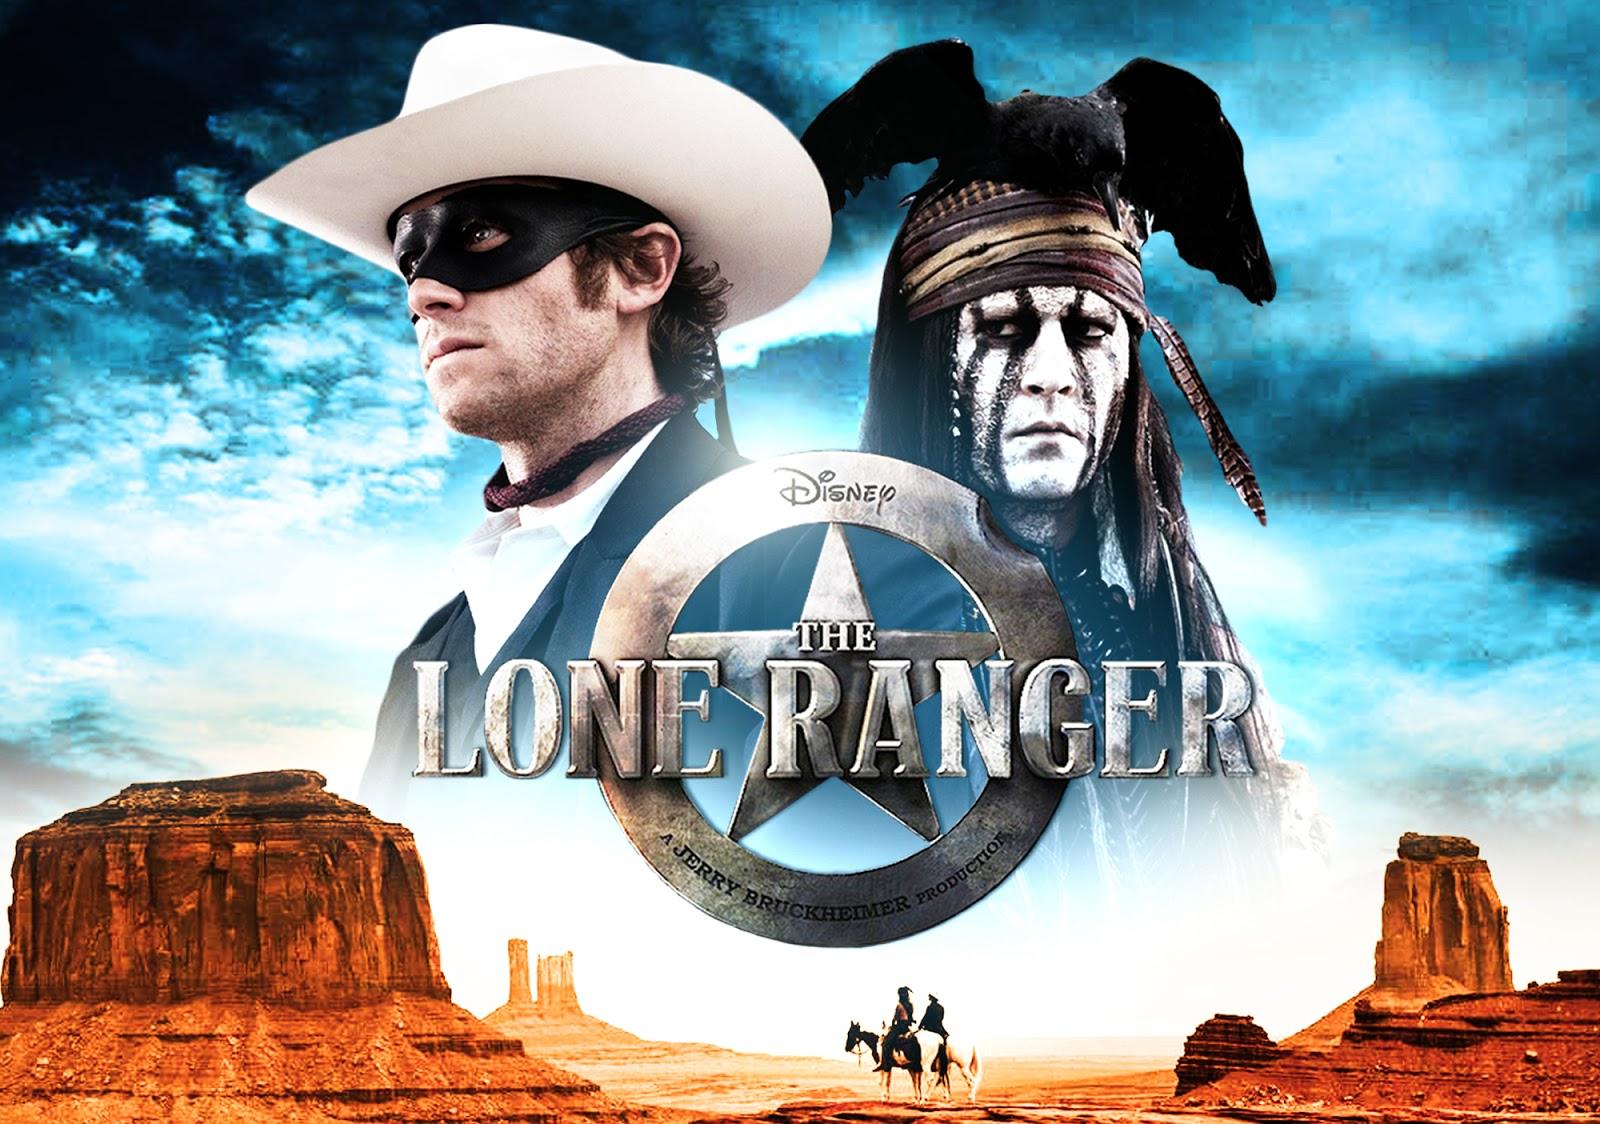 http://4.bp.blogspot.com/-z_tVJ7_m5Ek/UQgPiFHqzTI/AAAAAAAAITE/hIuYxHR0v3Y/s1600/The-Lone-Ranger-2013.jpg